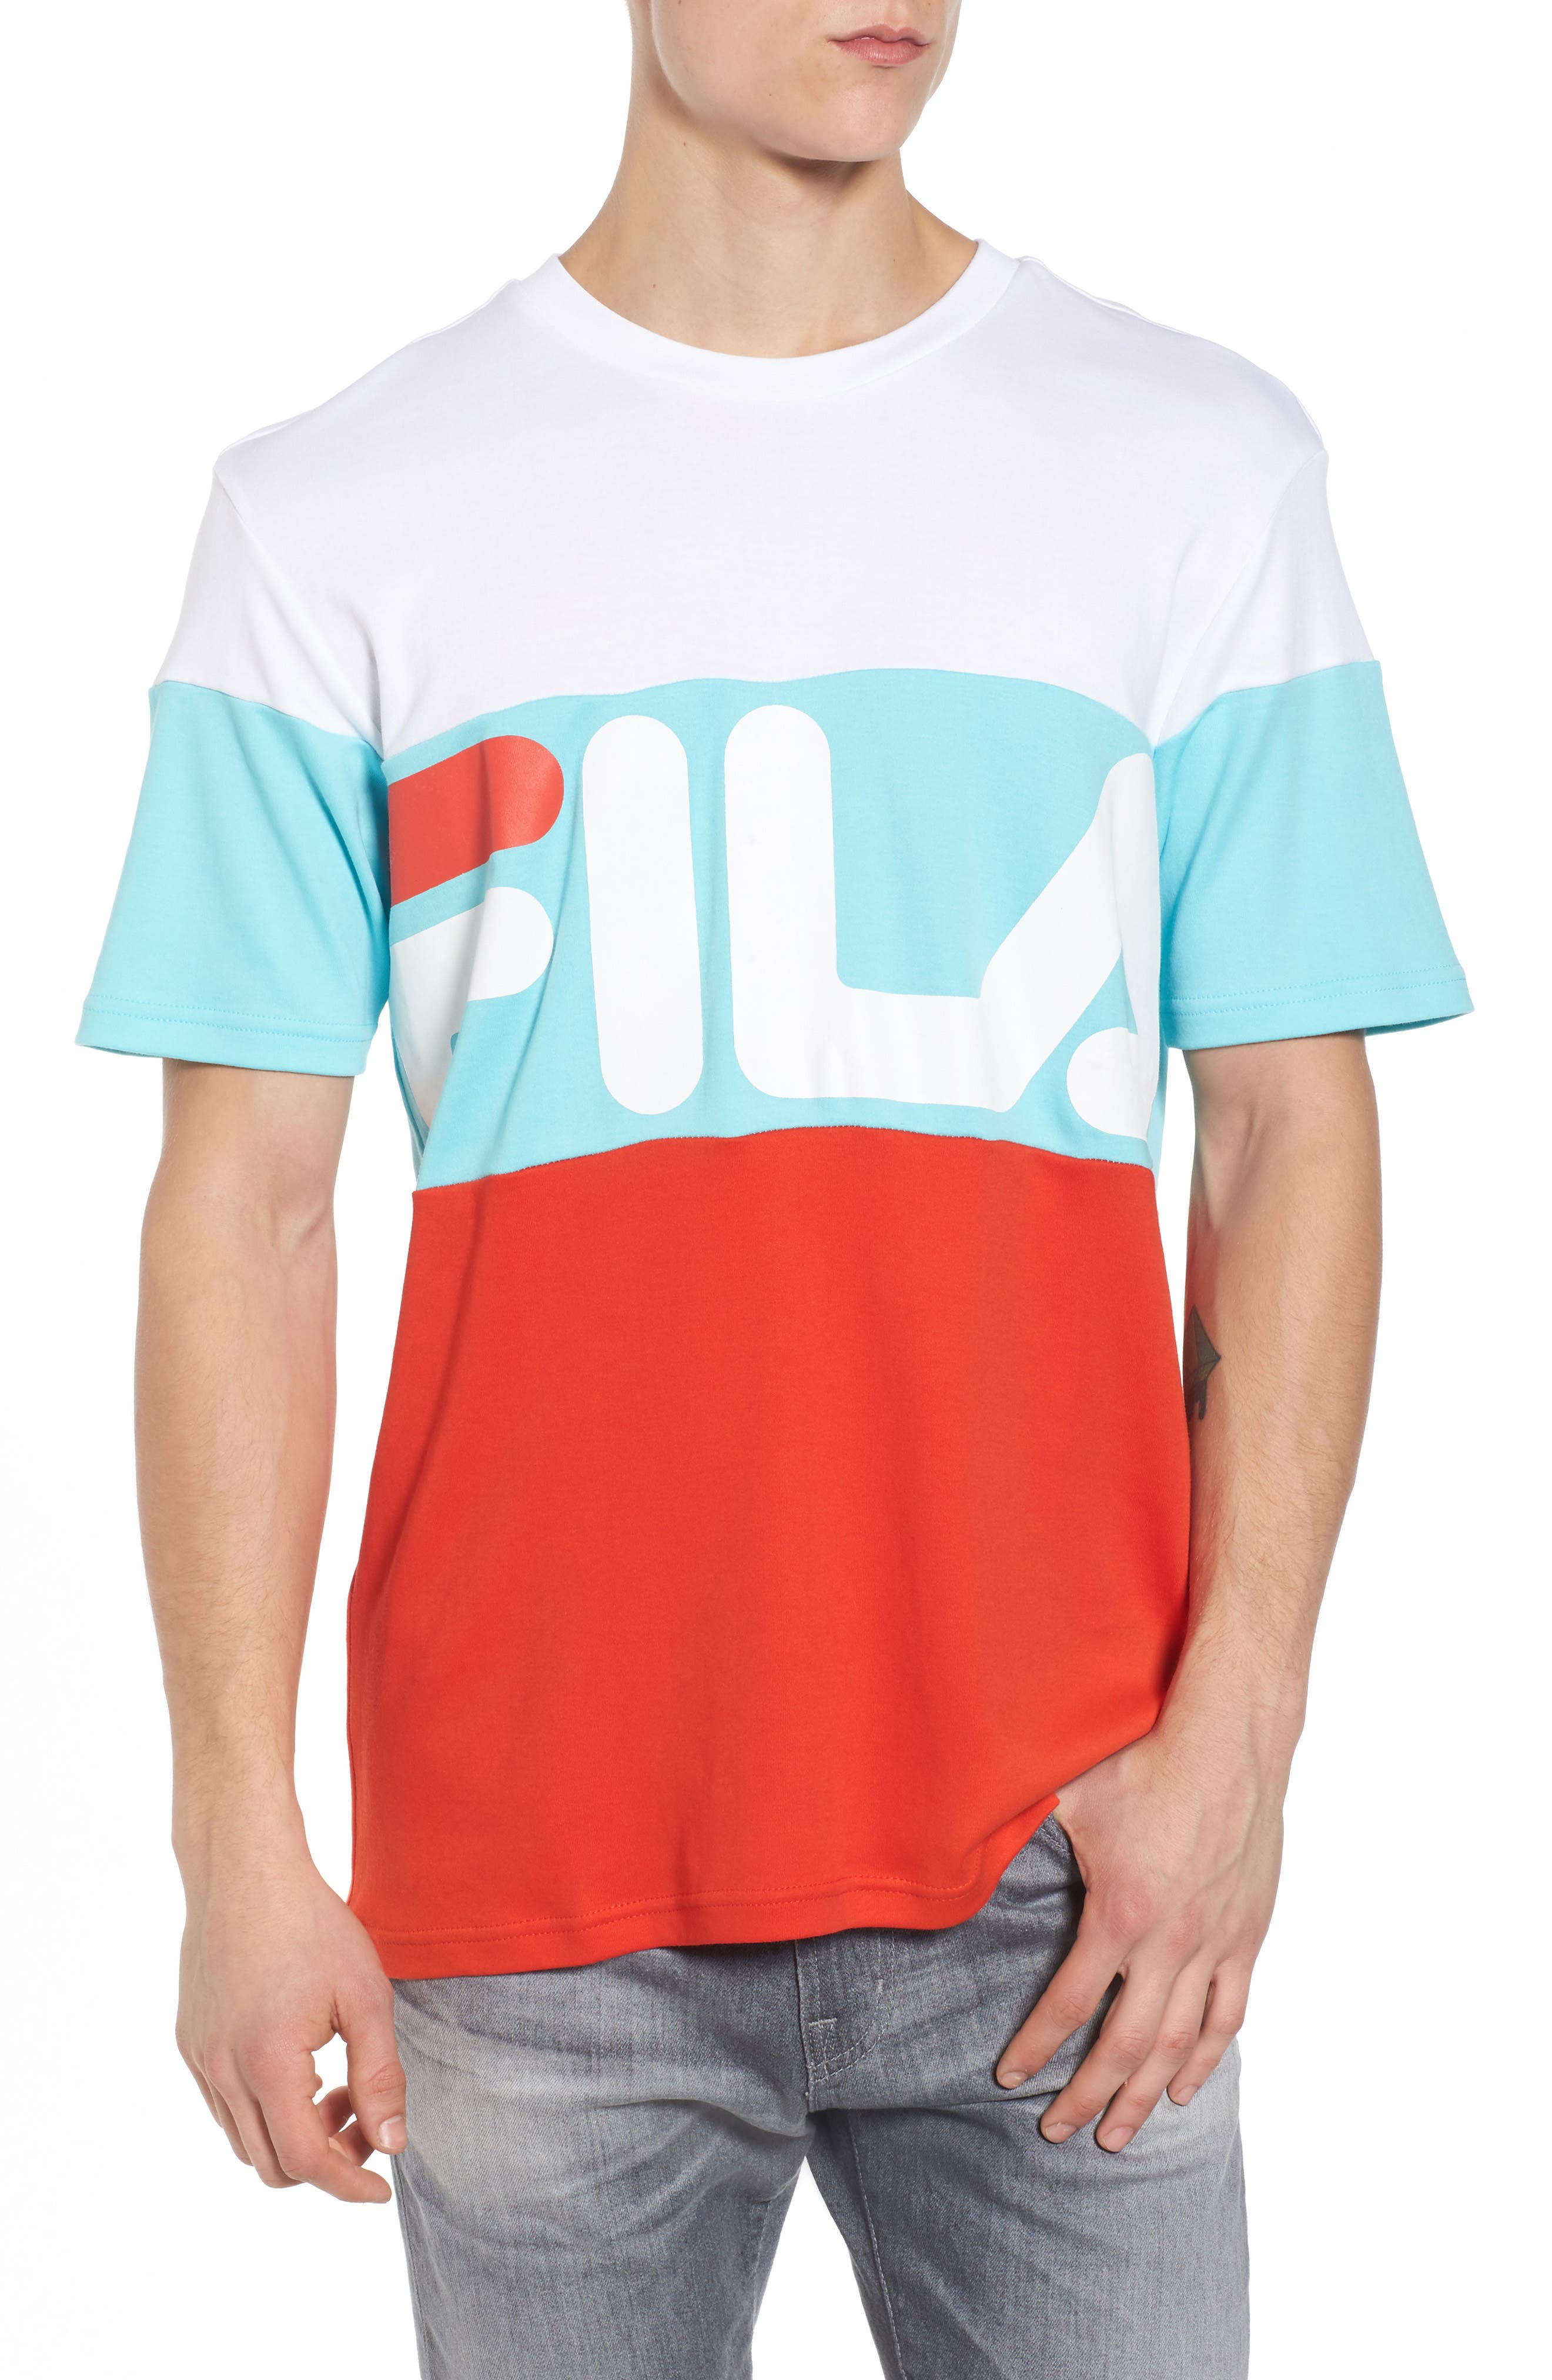 Main Image - FILA Vialli Colorblock Logo T-Shirt